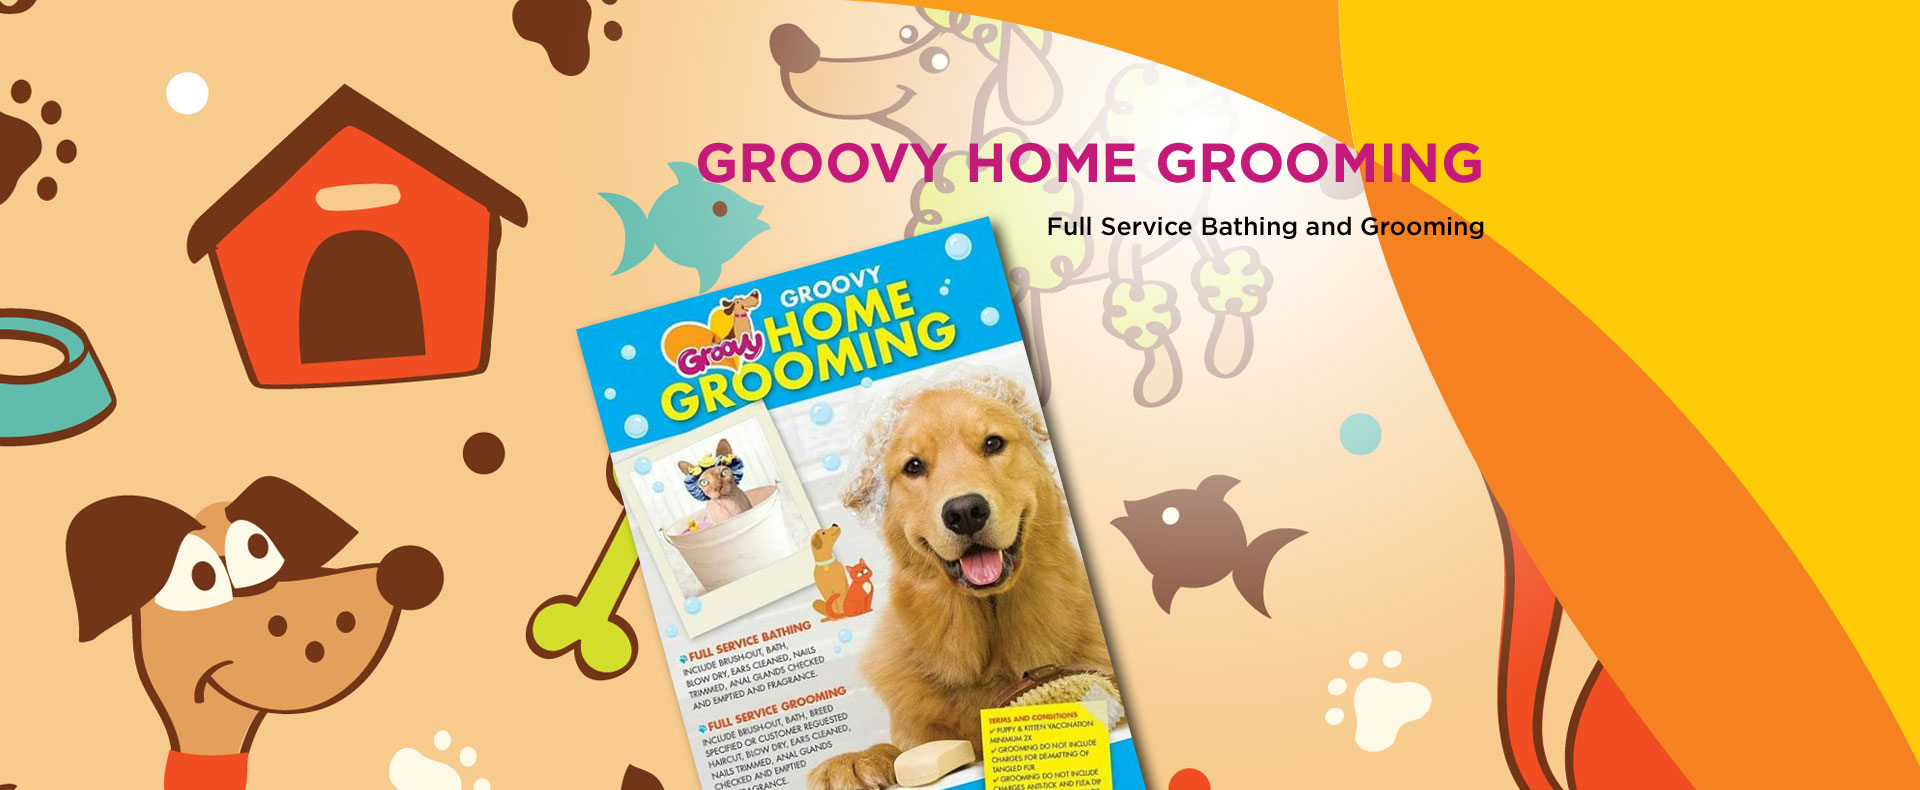 Home Grooming